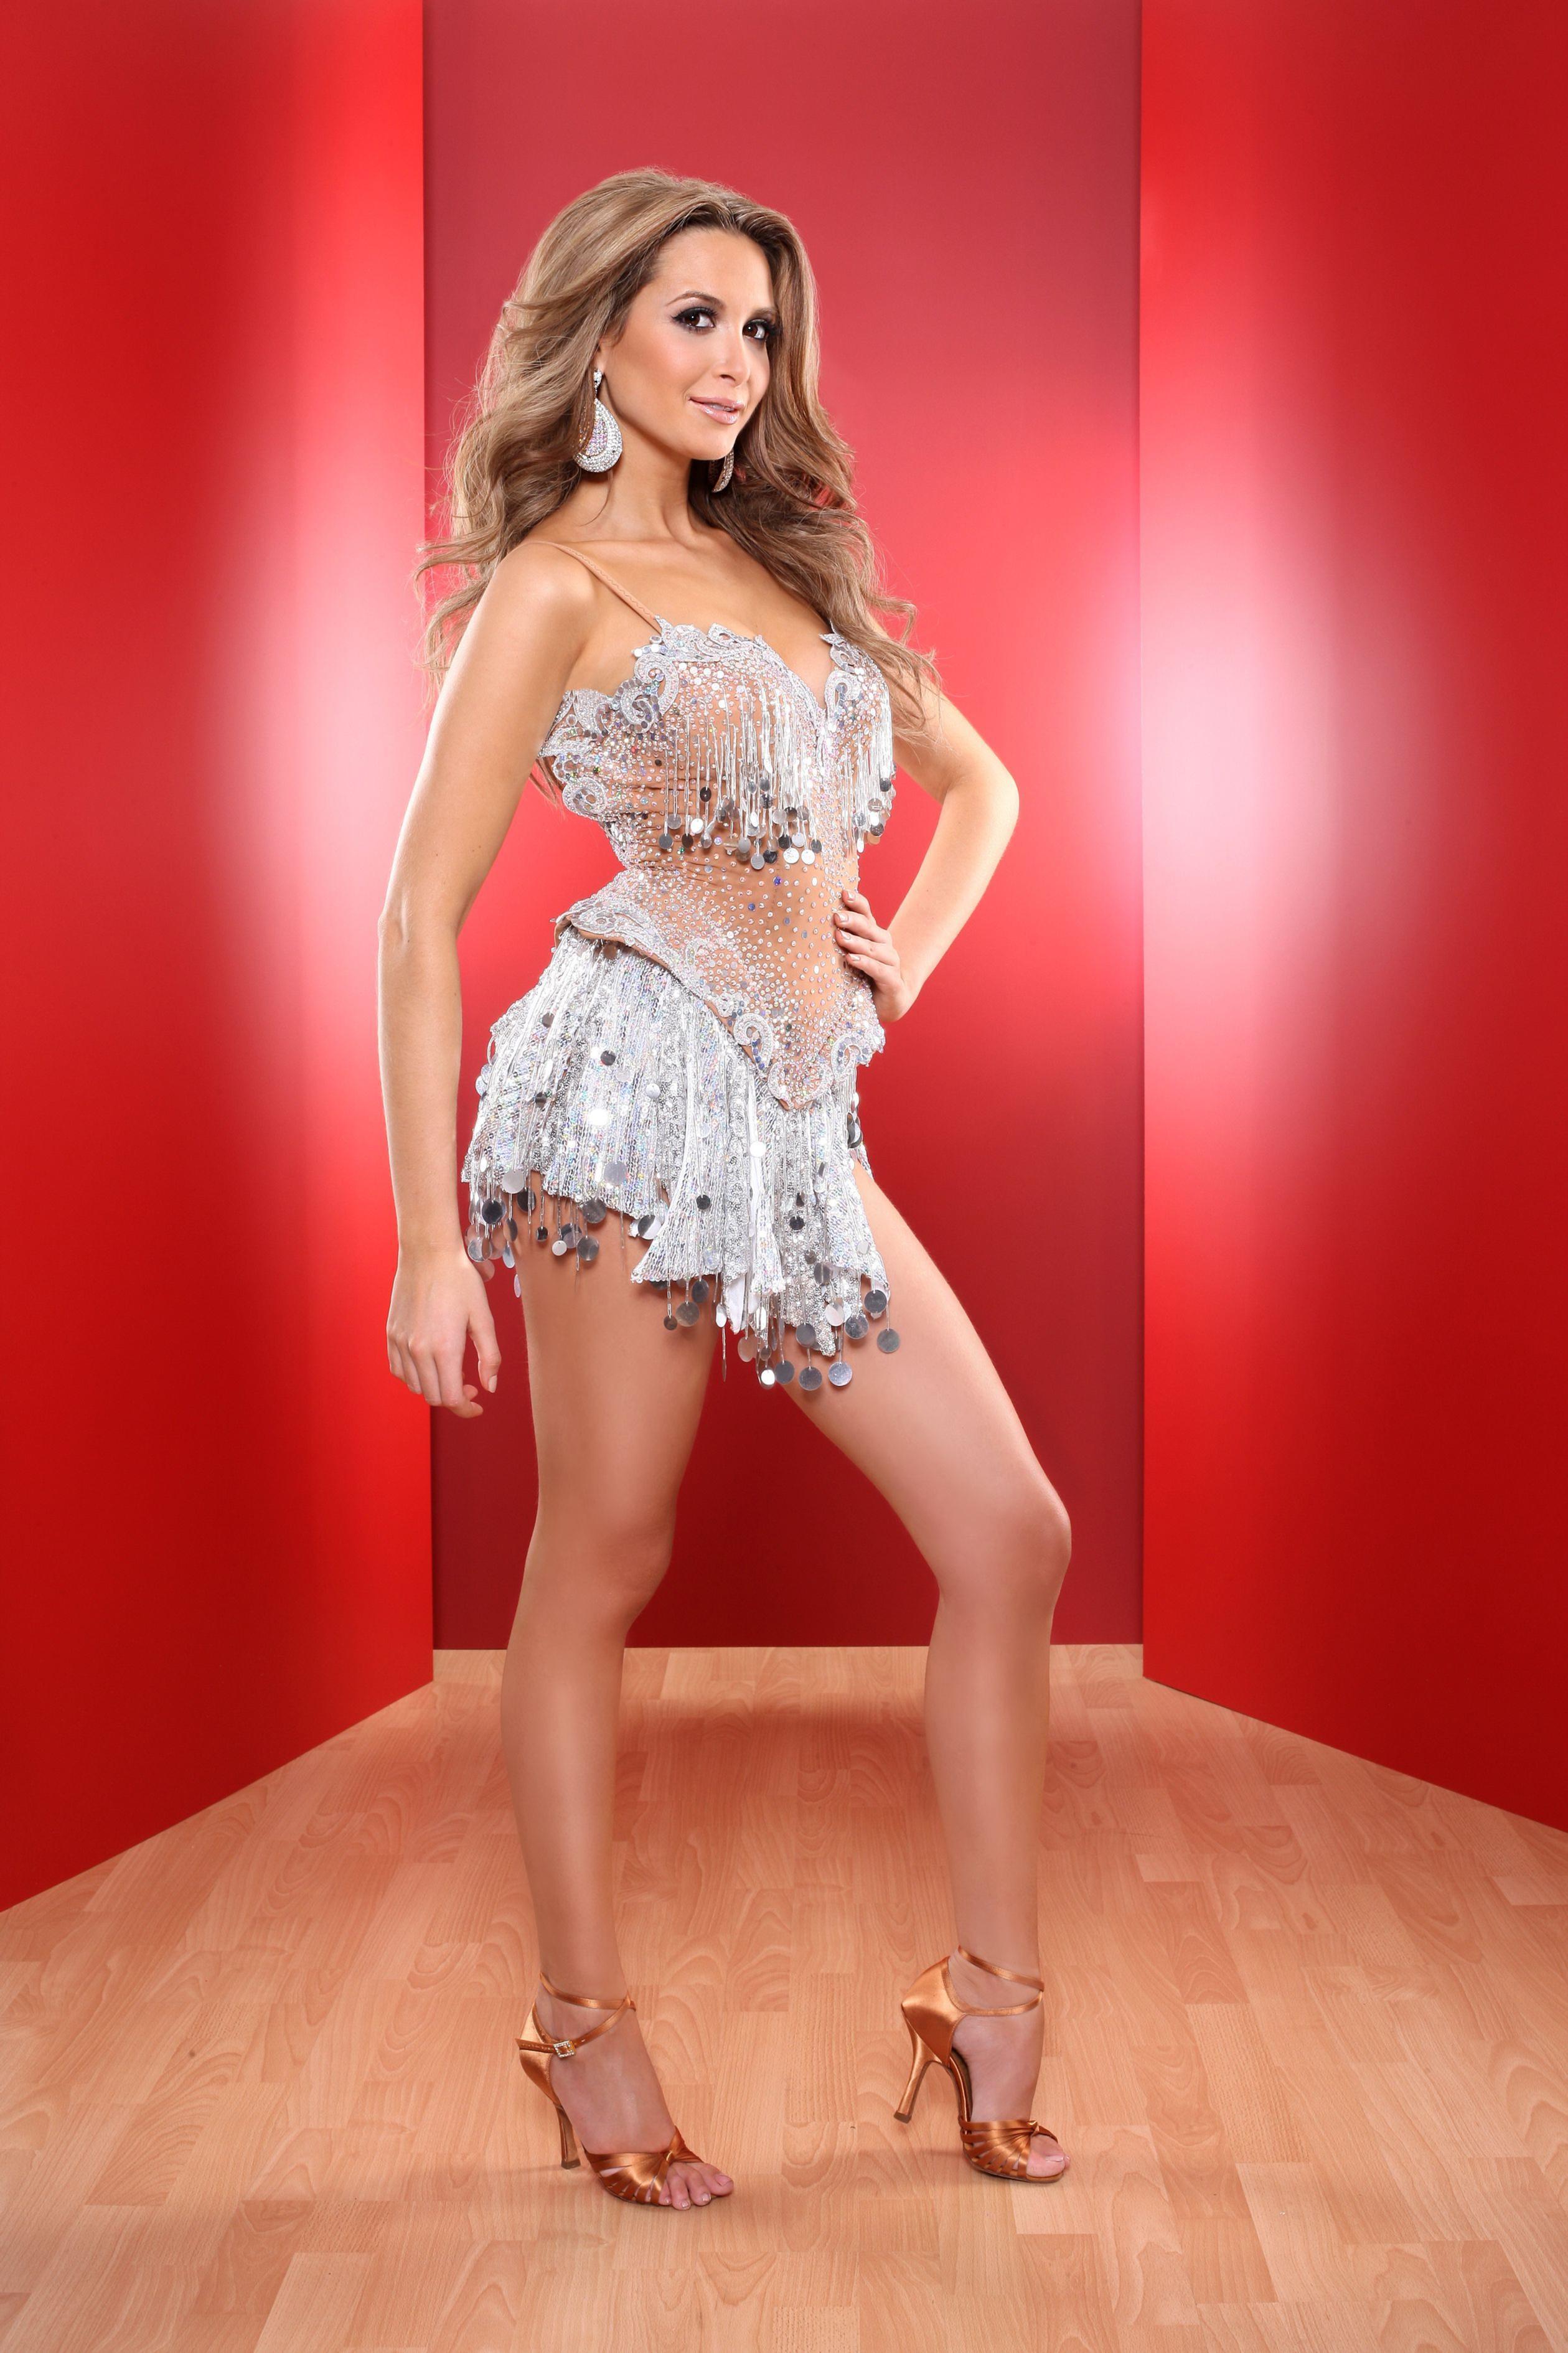 Mandy Capristo photo gallery - high quality pics of Mandy